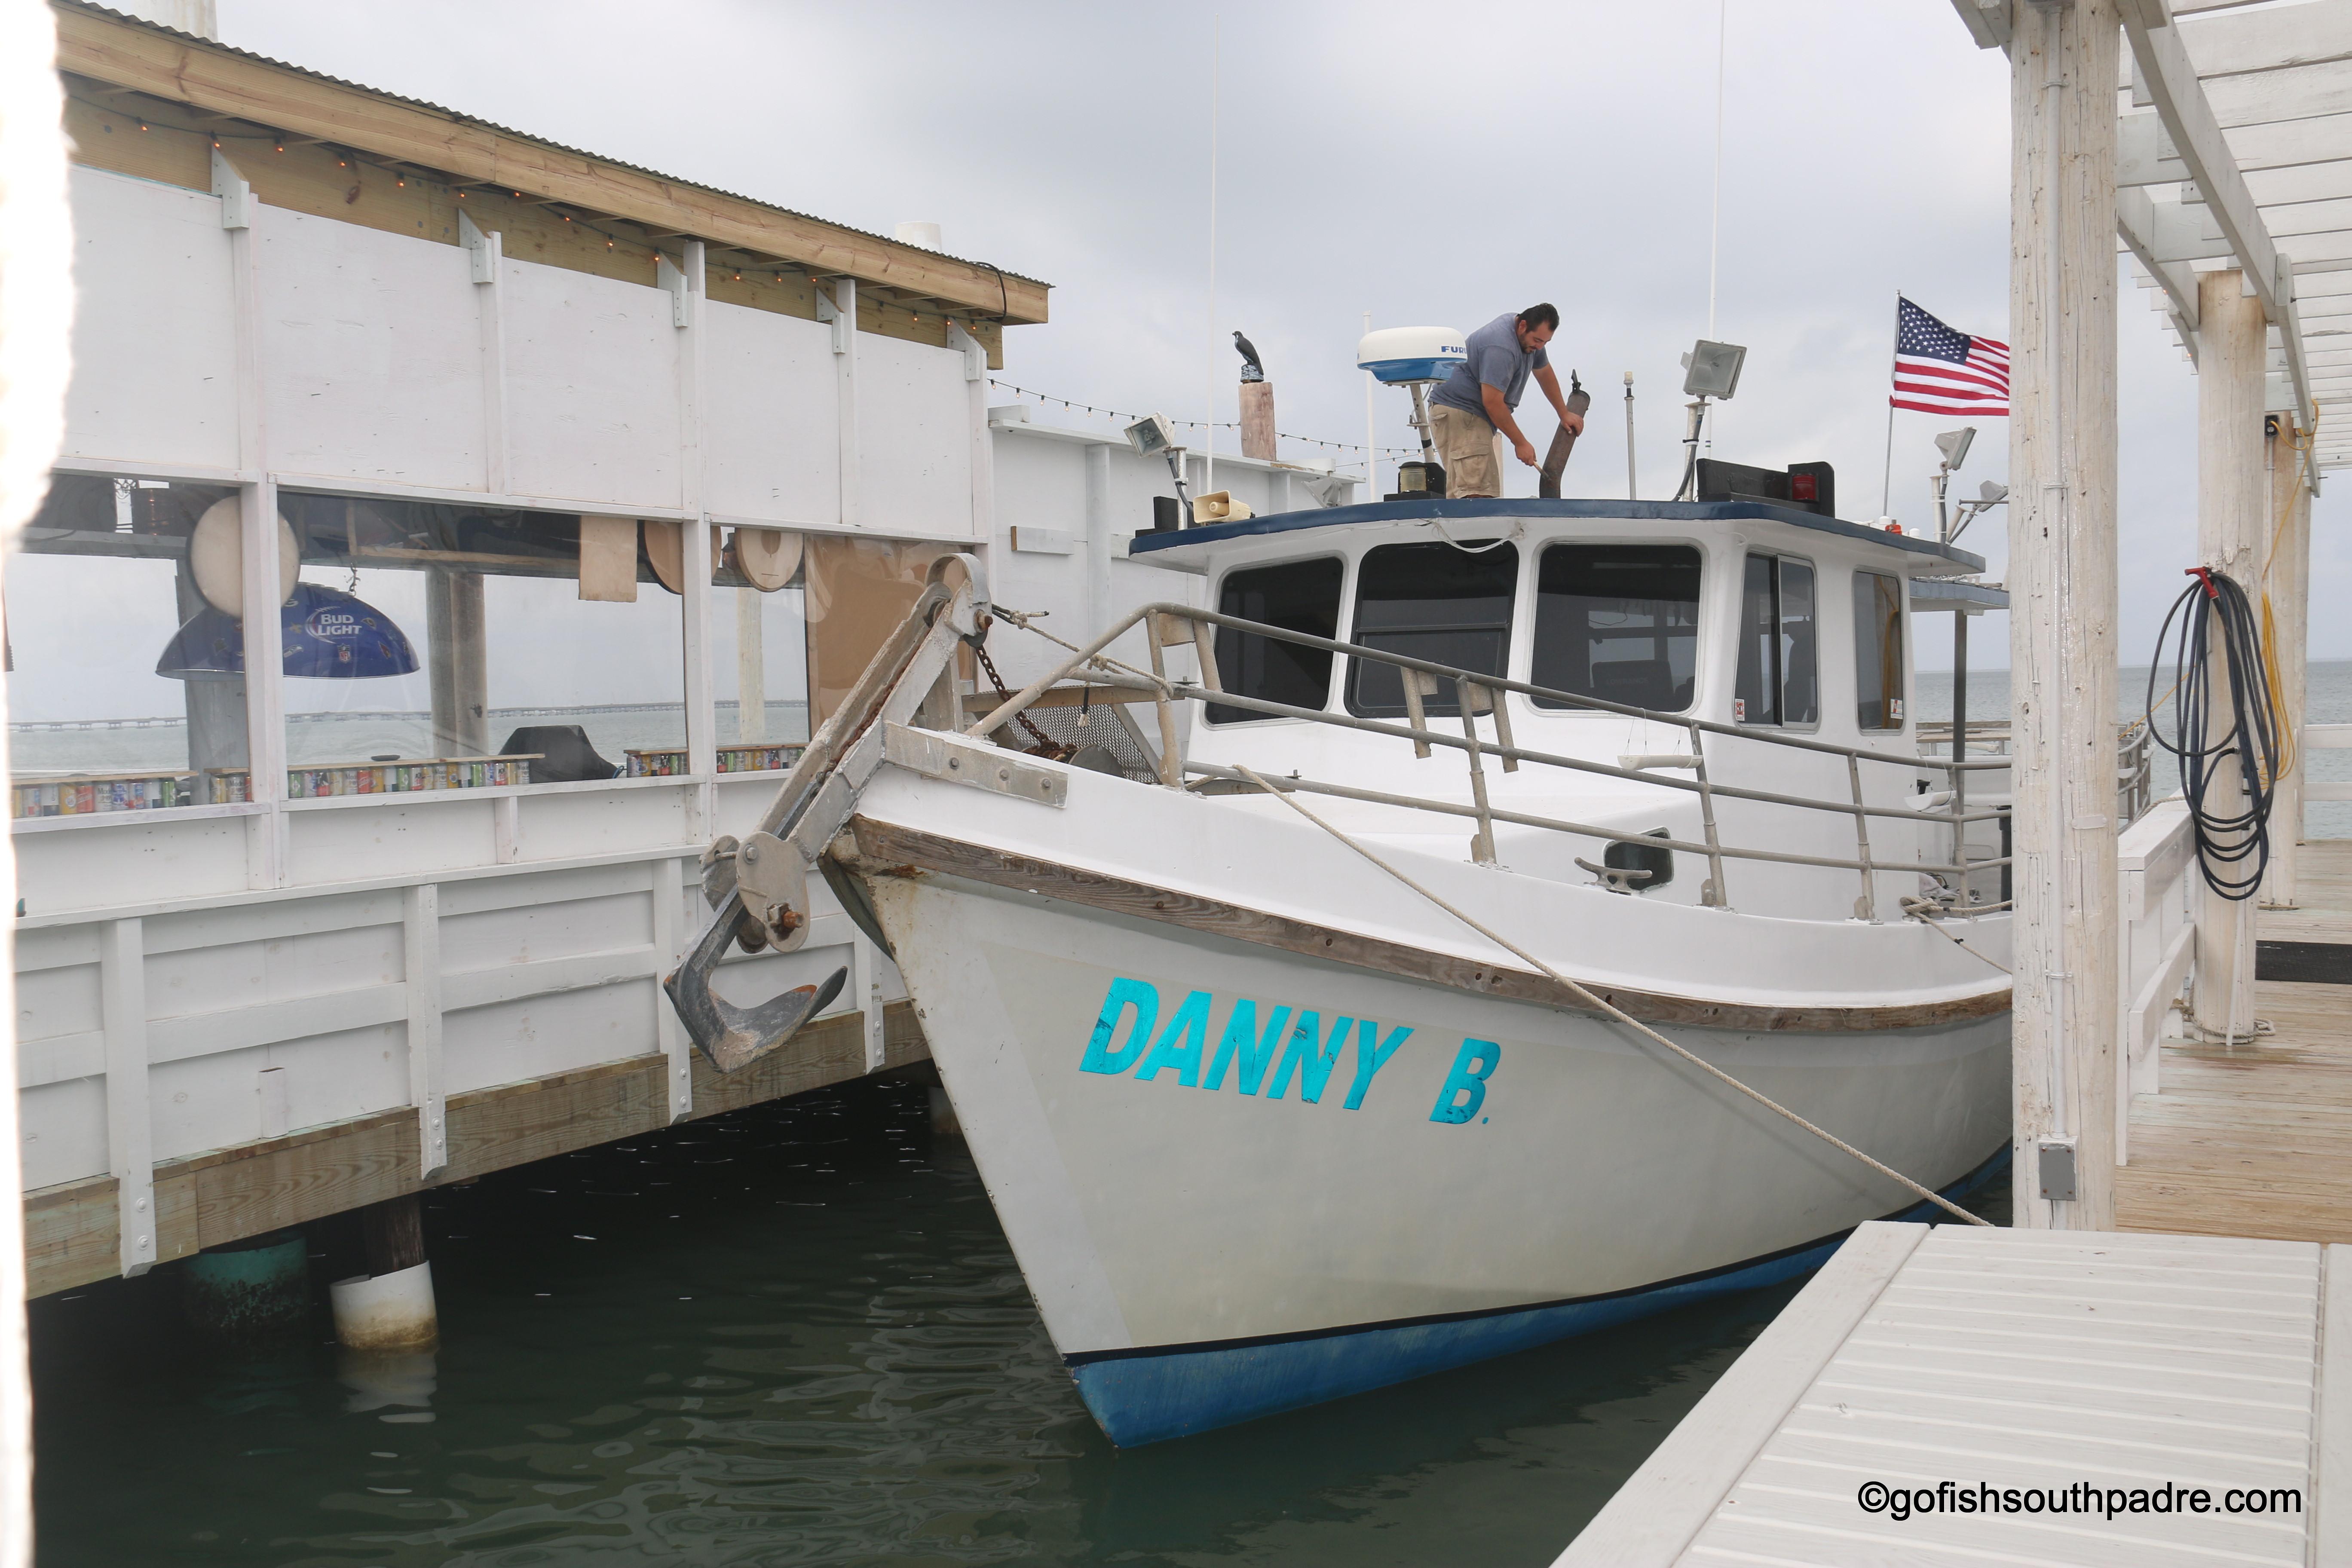 Danny B South Padre Island,TX.